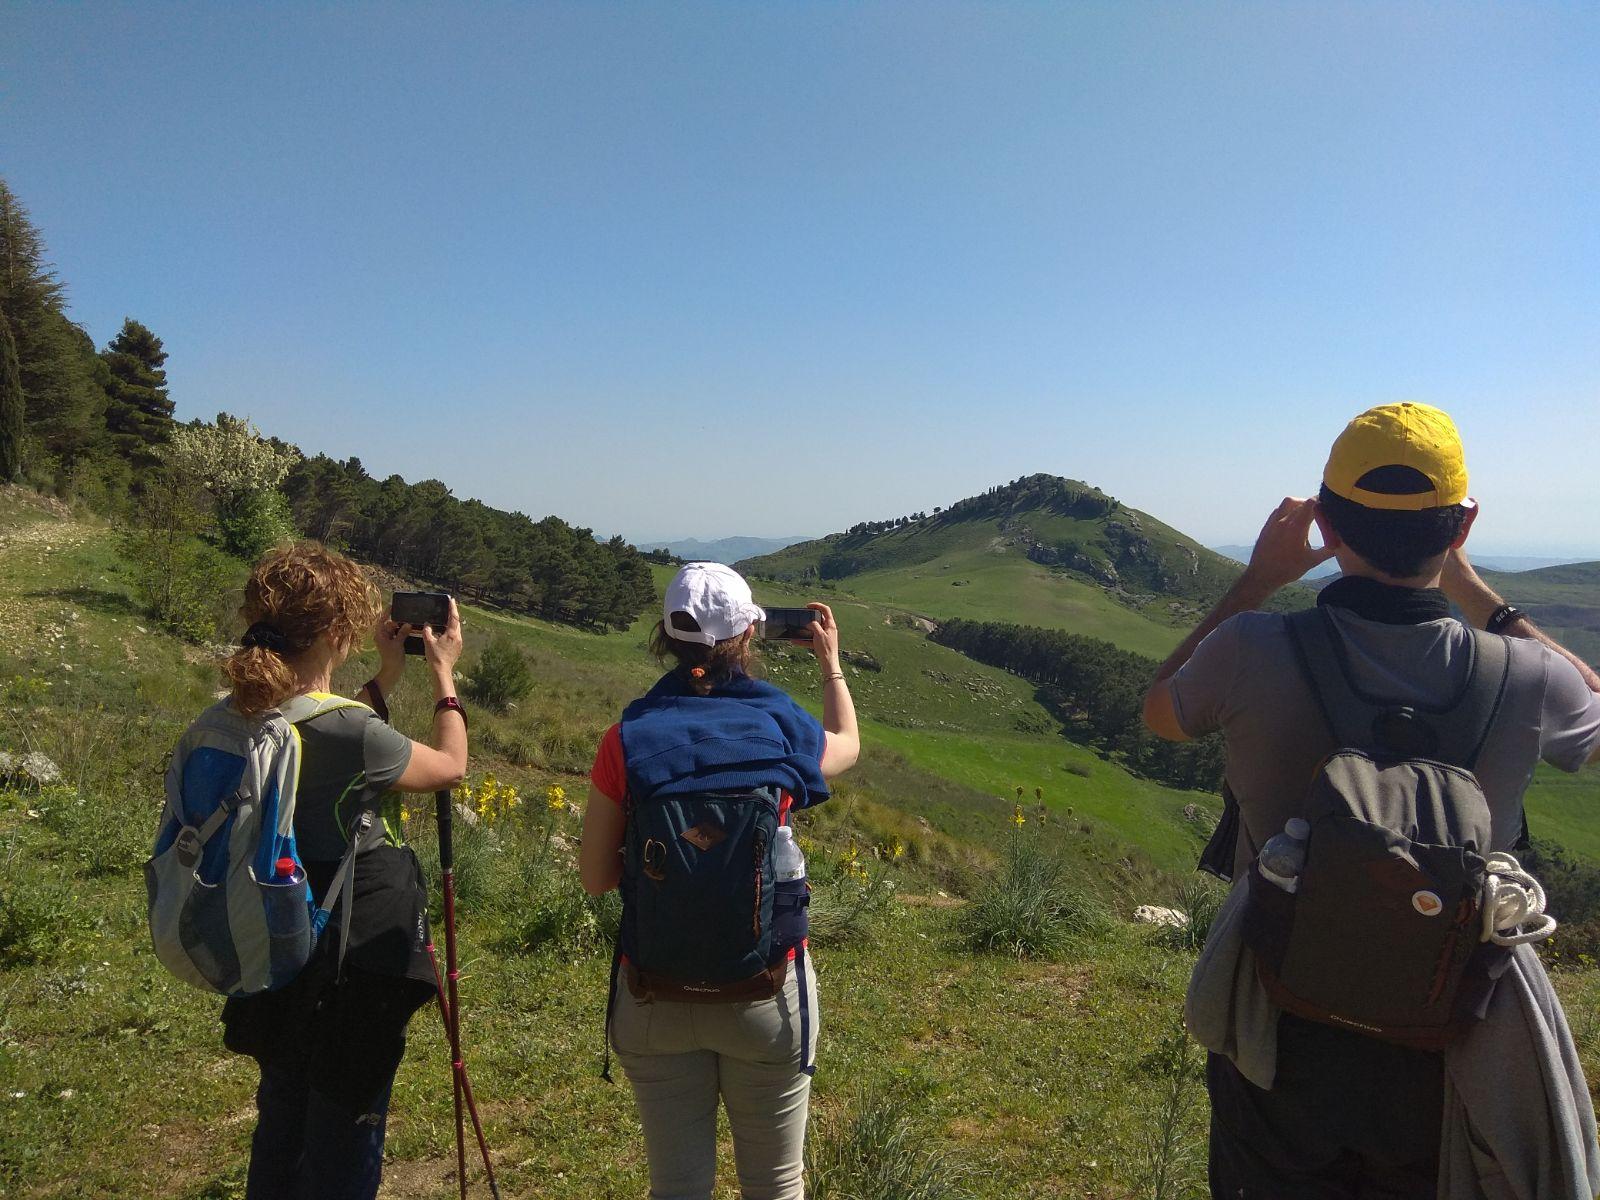 Santo Stefano Quisquina - Trekking archeo-gastronomico